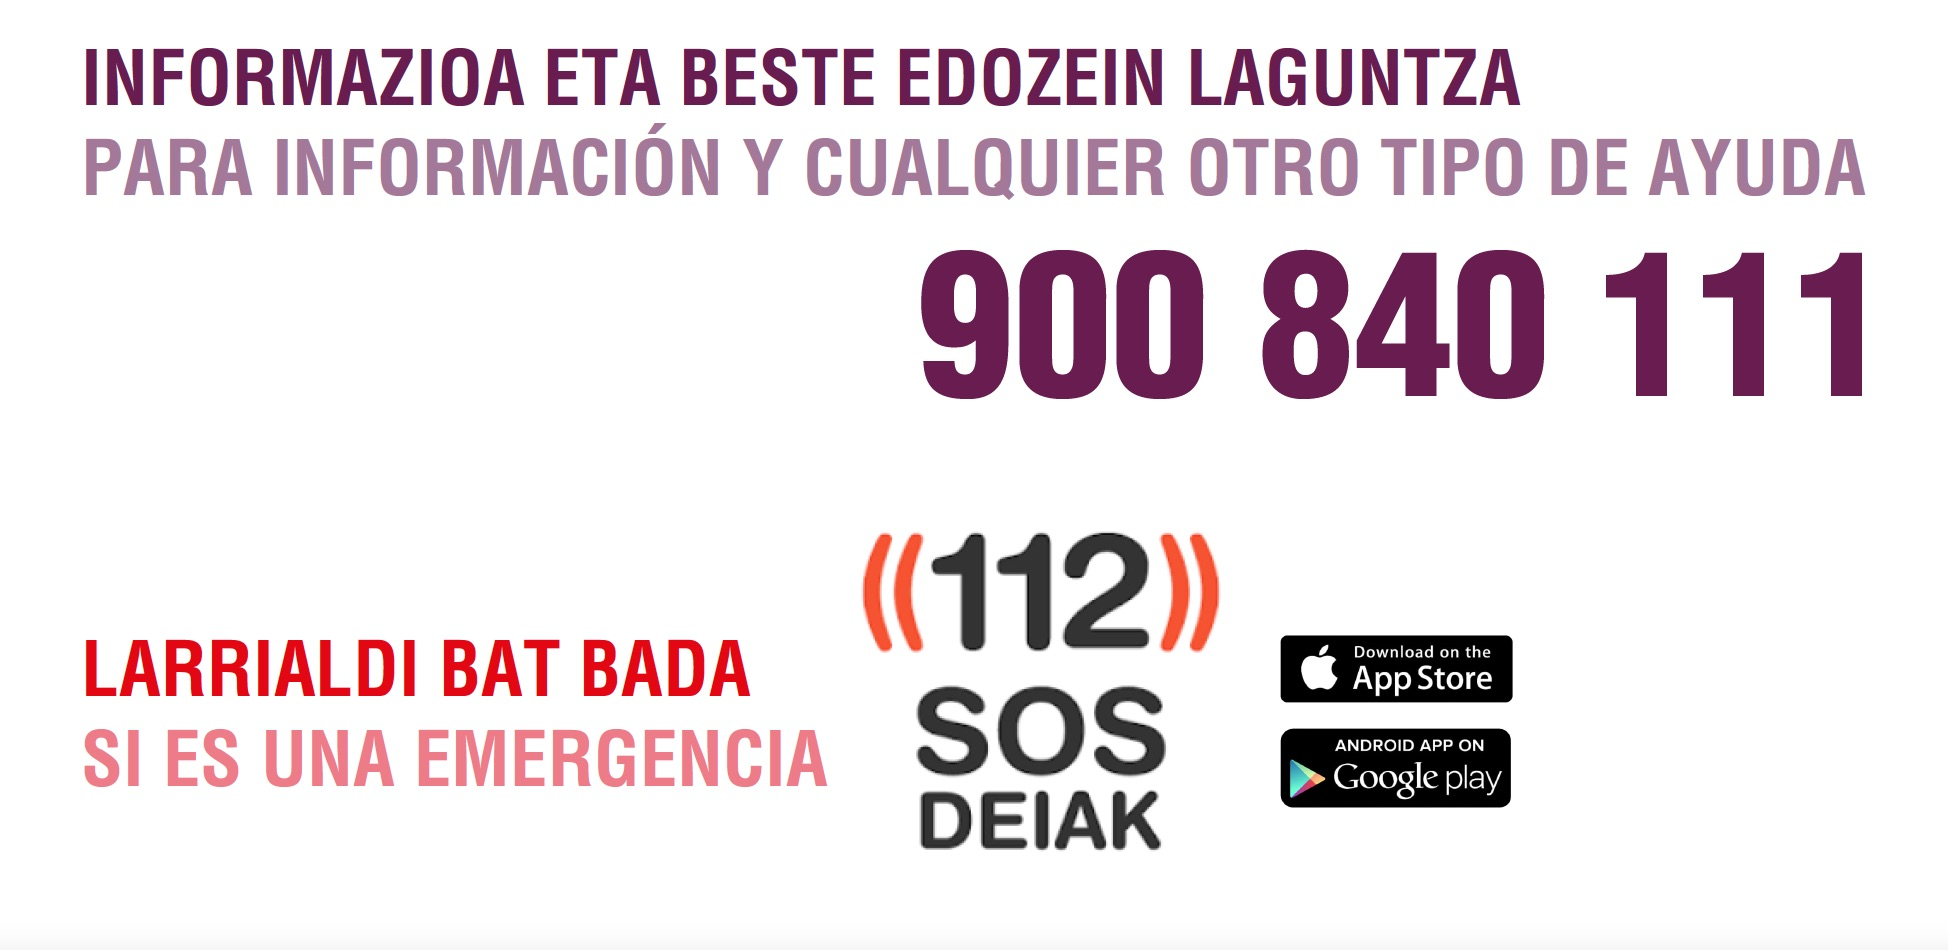 TELEFONOAK.jpg